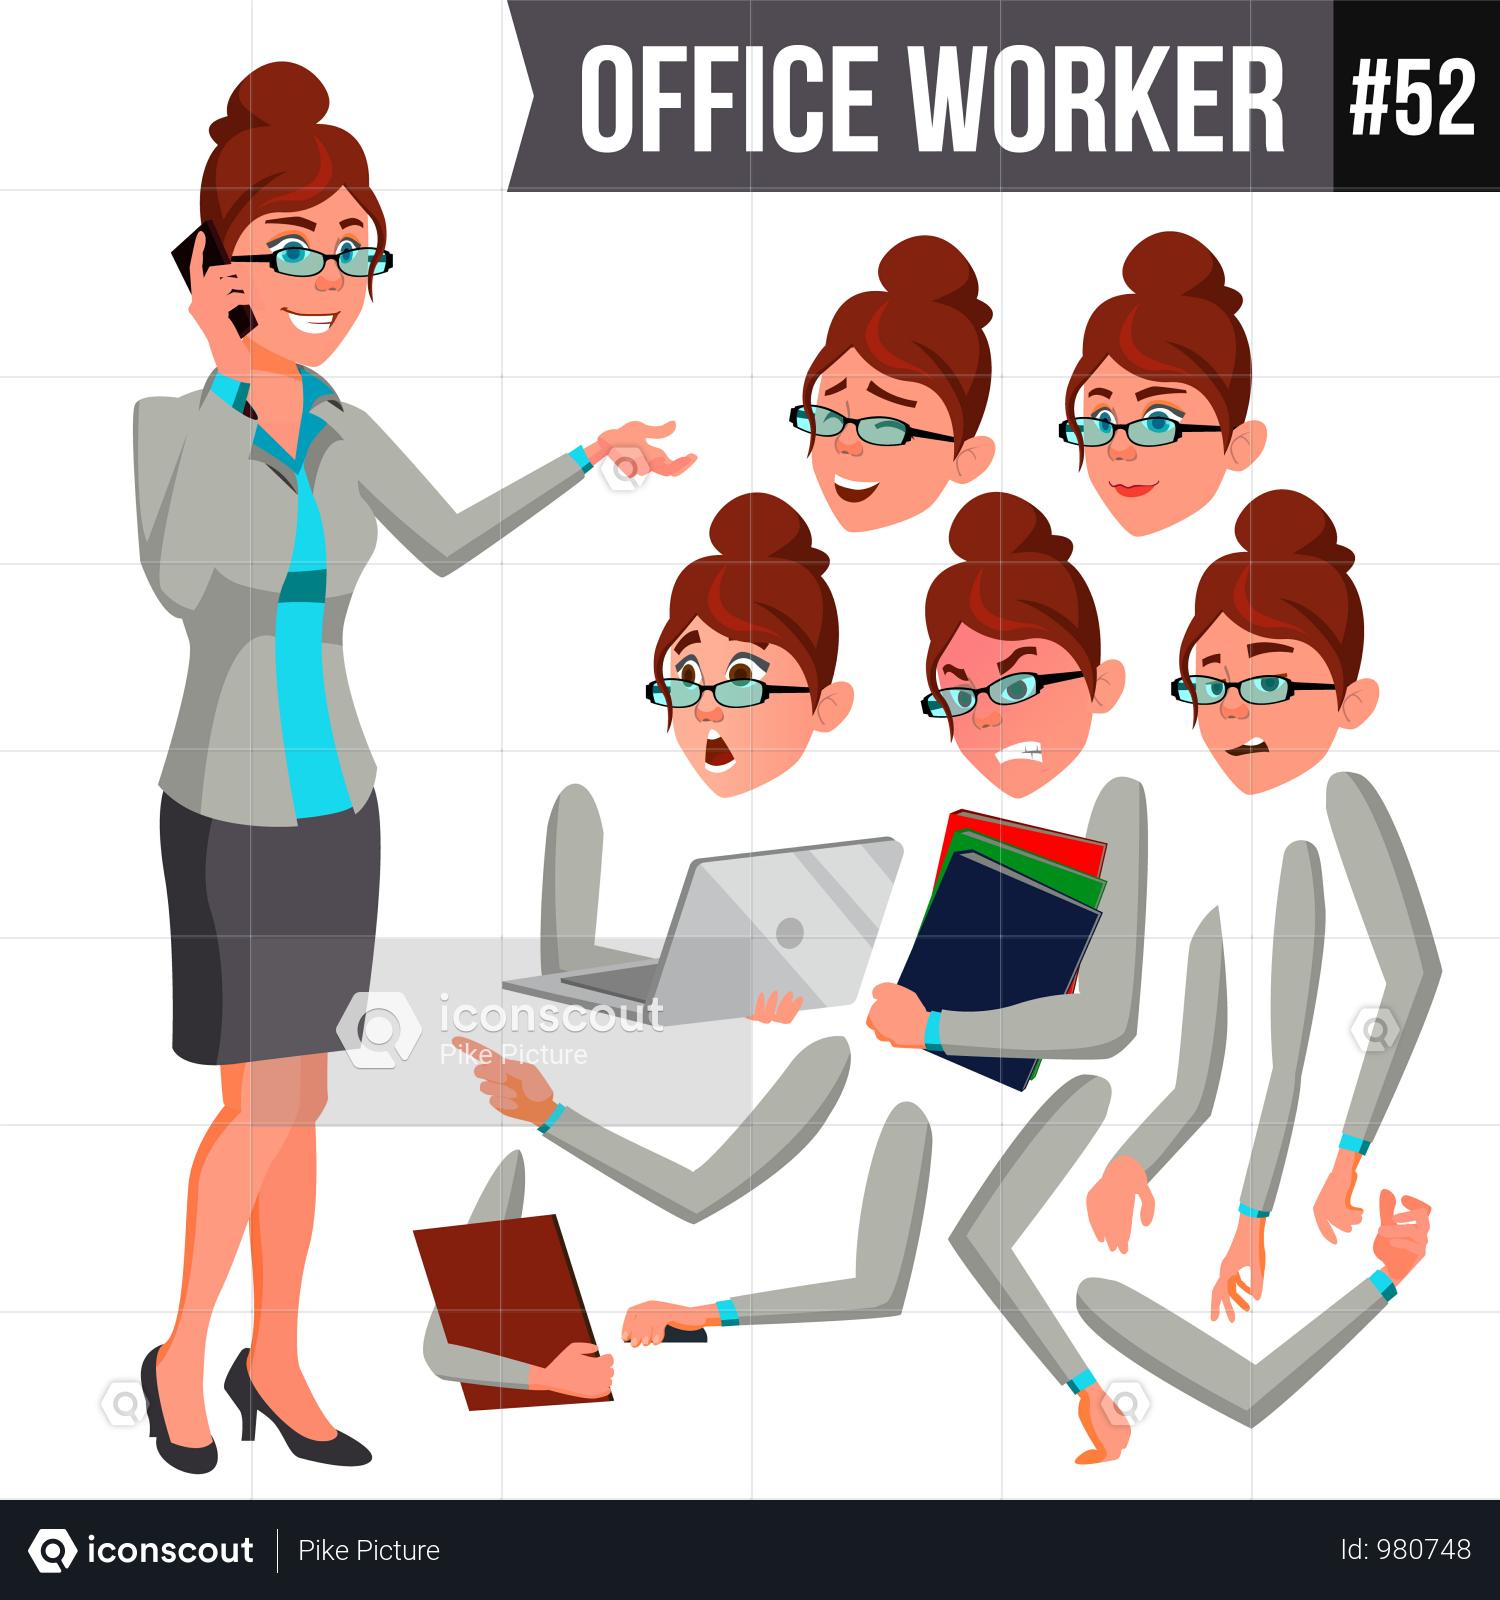 Premium Office Worker Illustration Download In Png Vector Format Character Illustration Kids Vector Cartoon Illustration